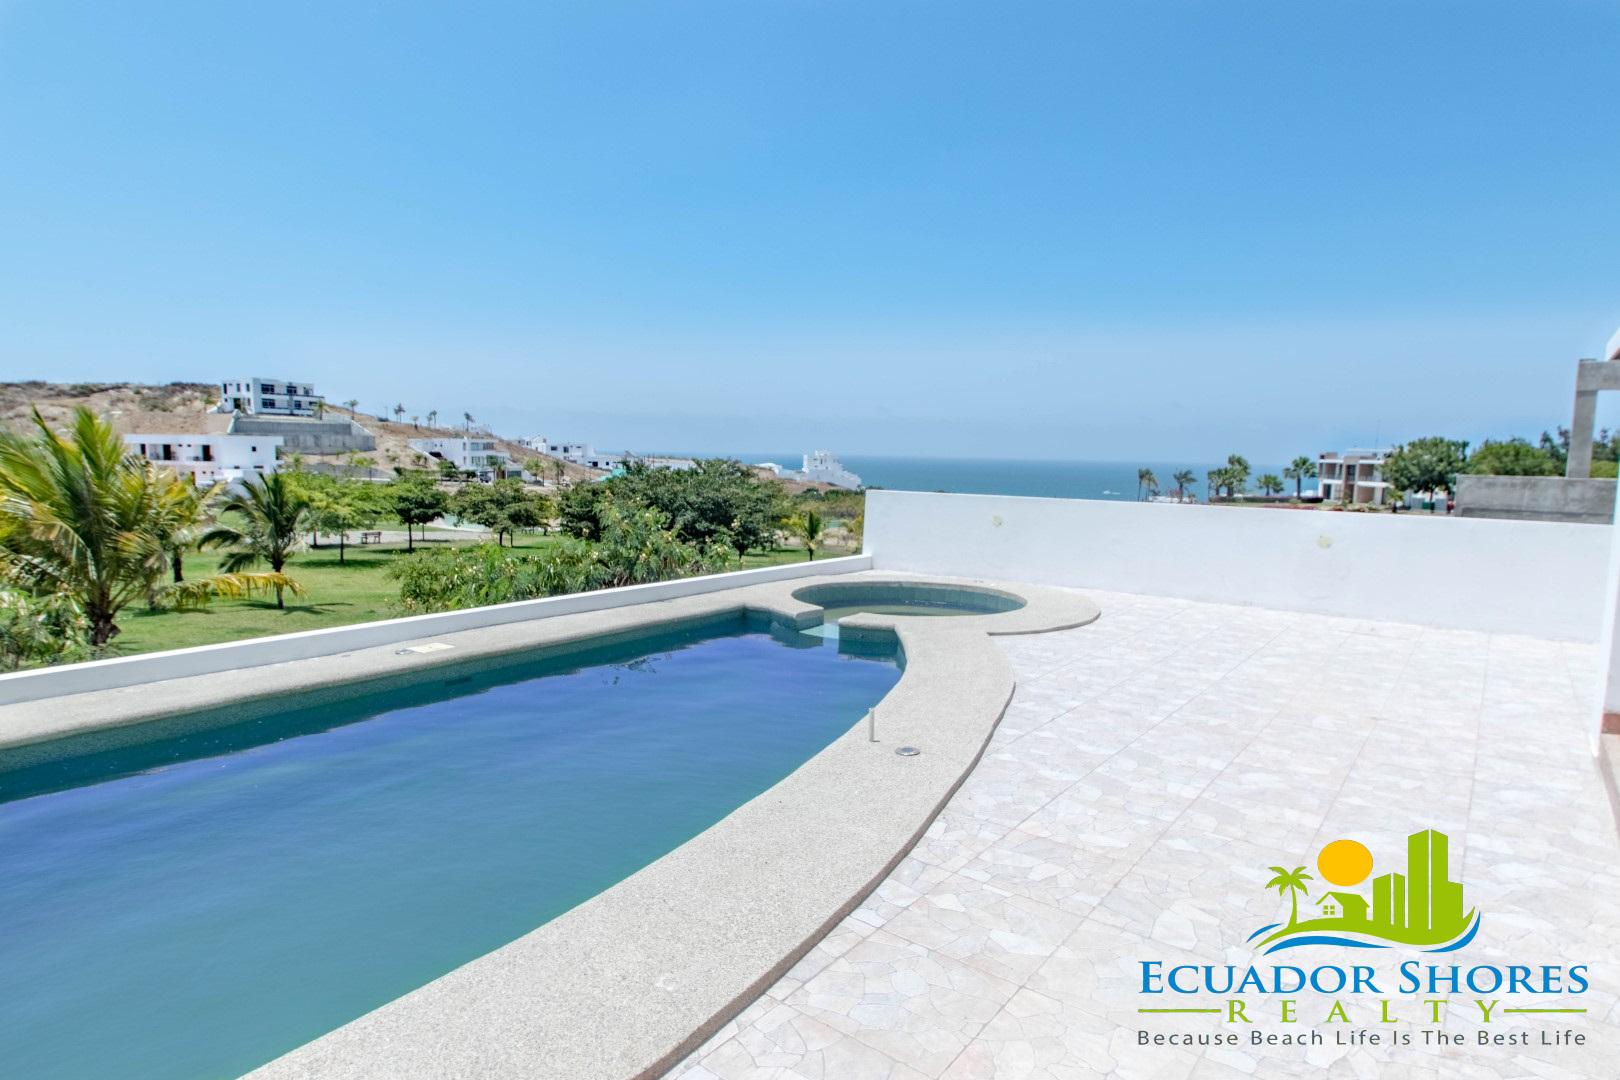 Pool home Manta Ecuador! New construction!